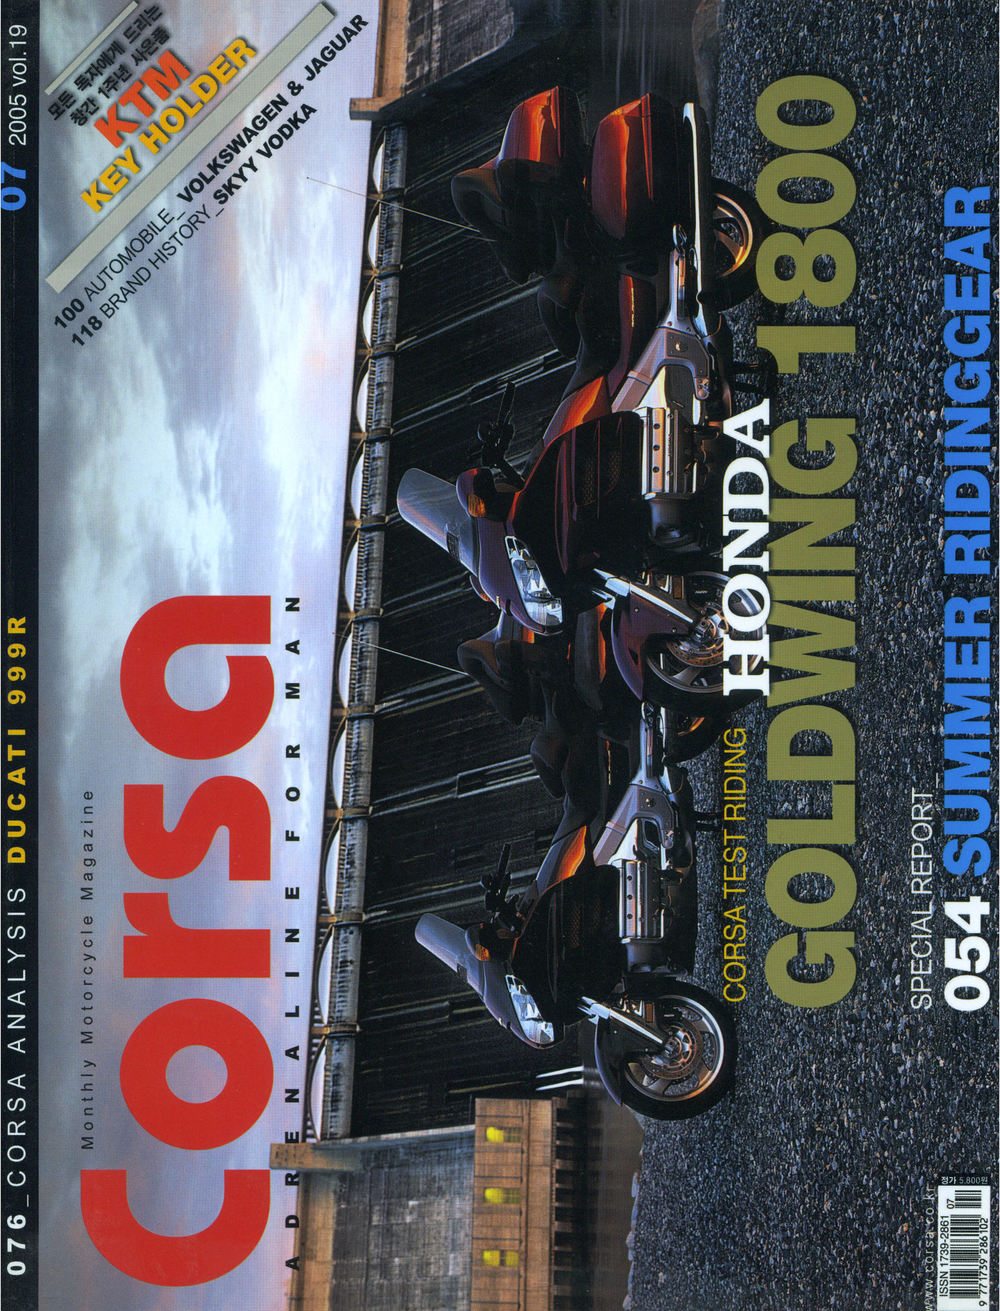 2005-6 Corsa cover.jpg